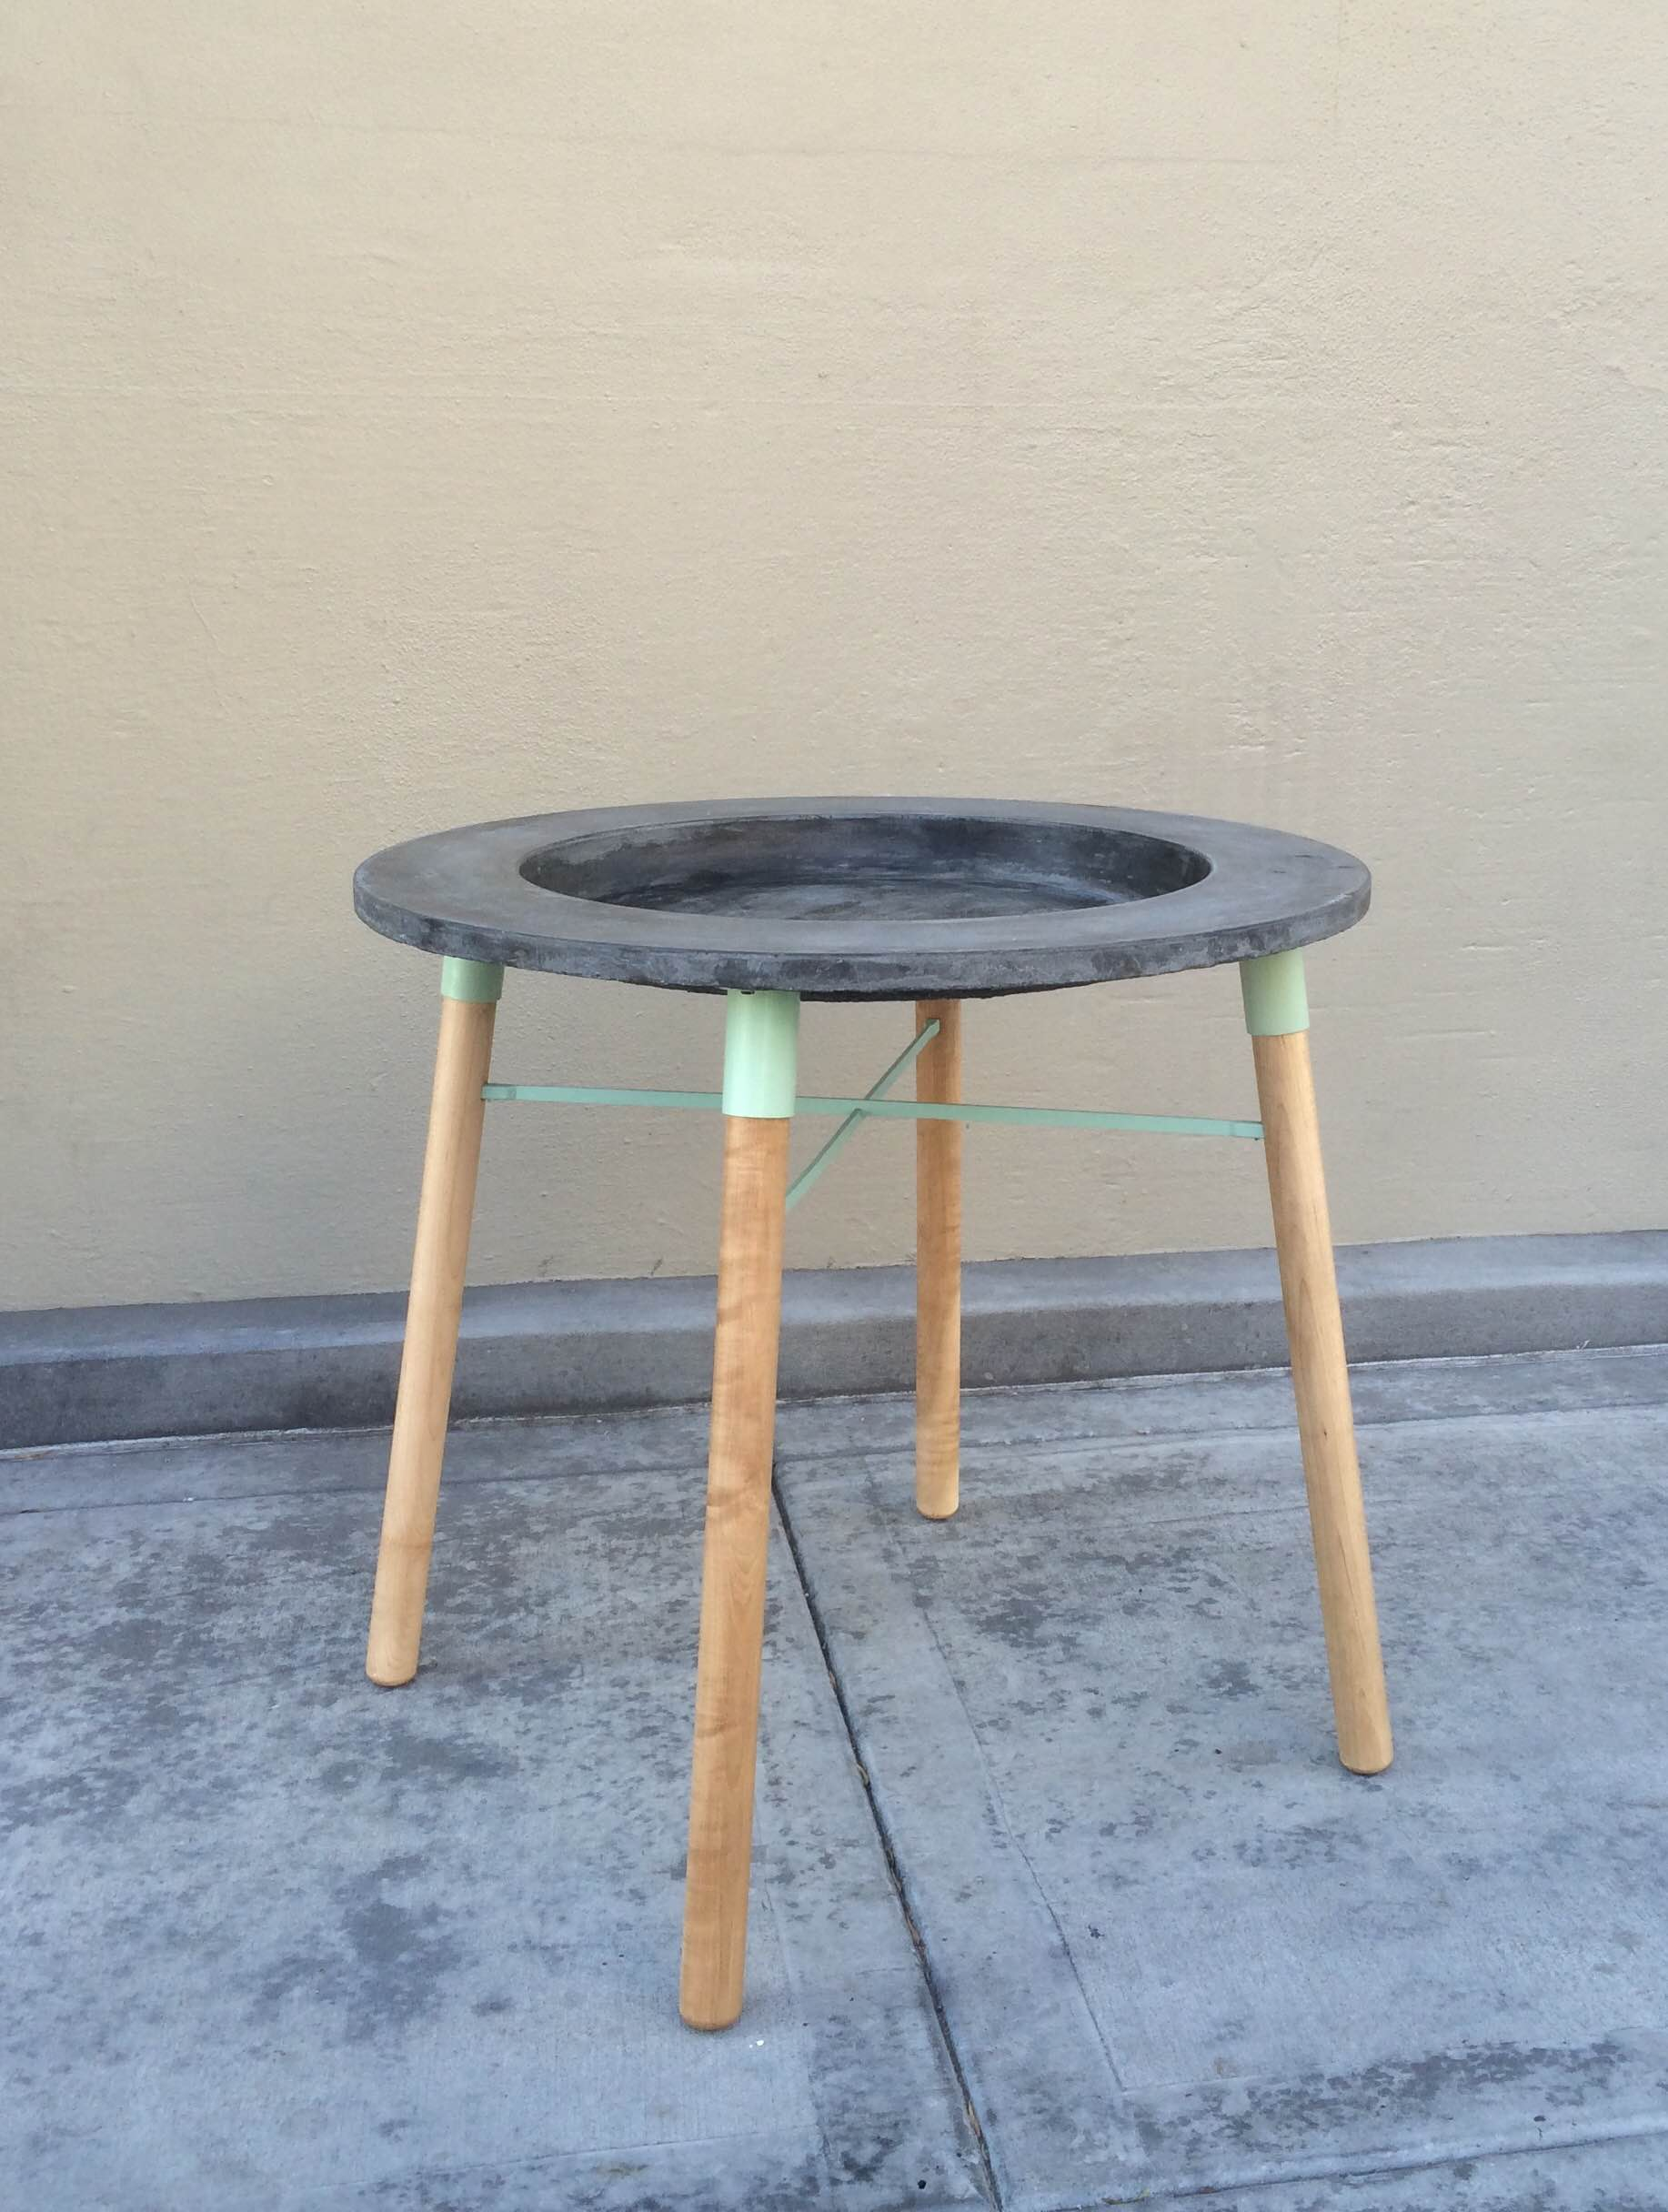 Concrete, aluminum and maple table.